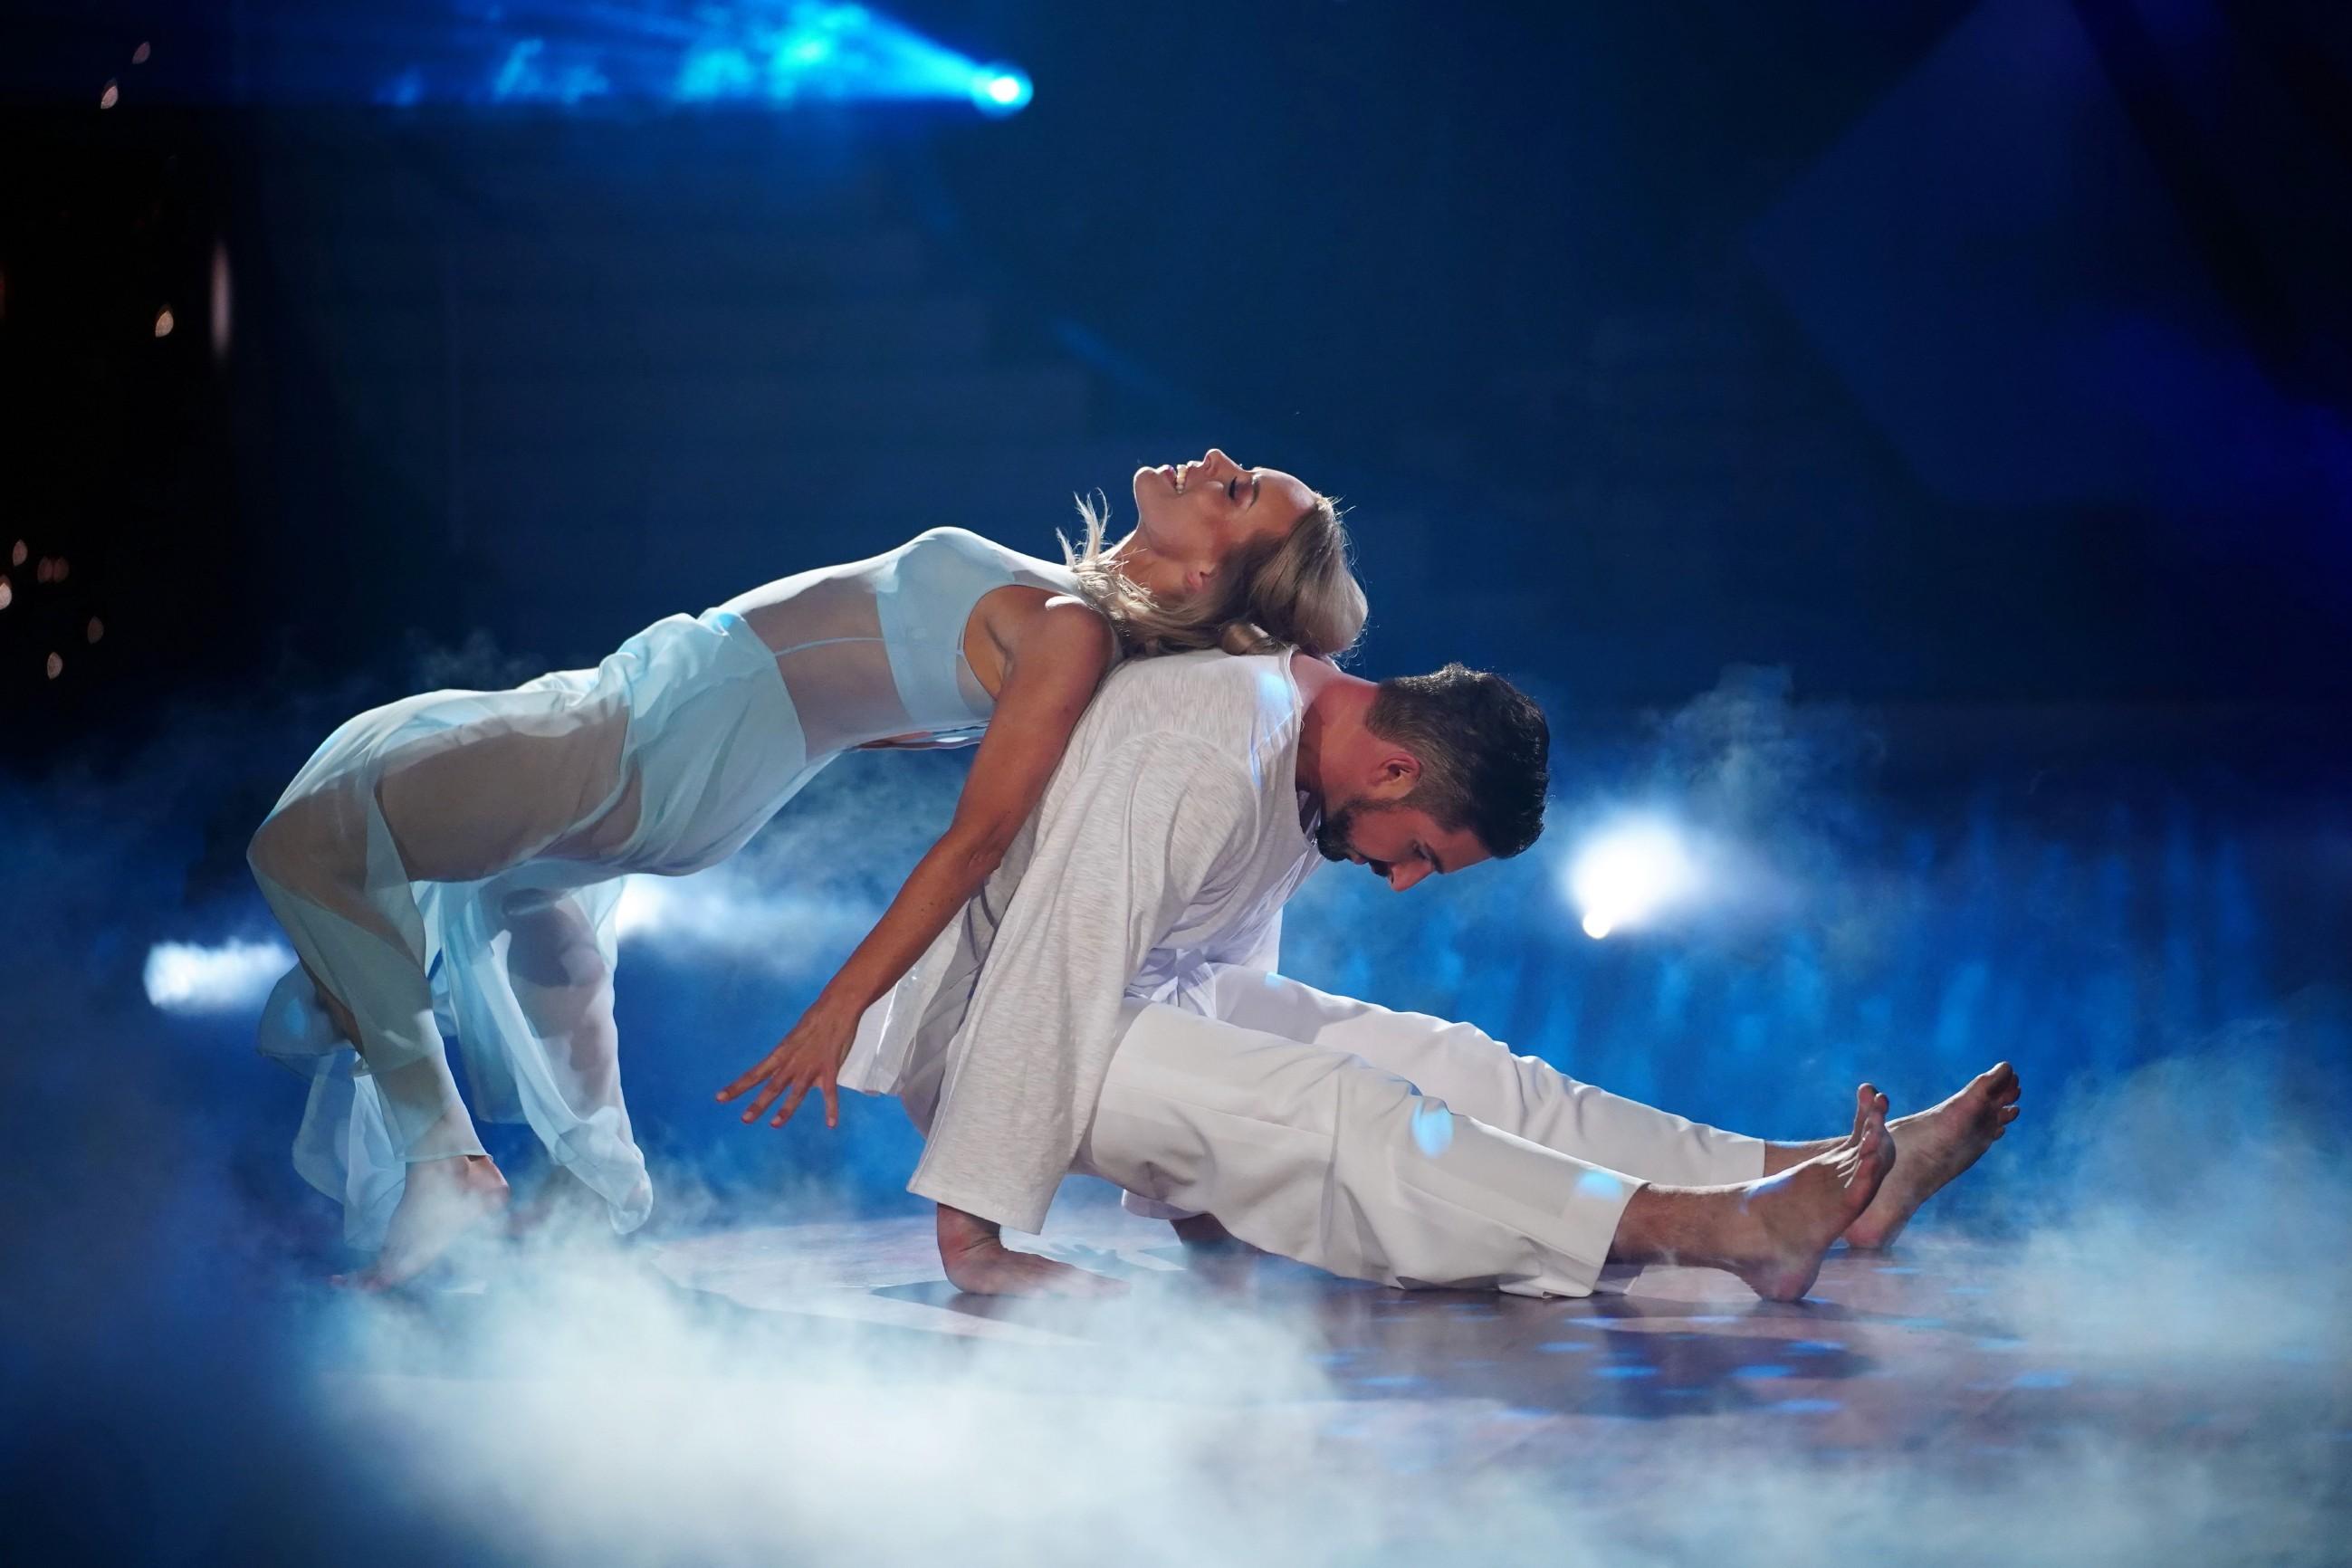 Benjamin Piwko und Isabel Edvardsson tanzen Contemporary